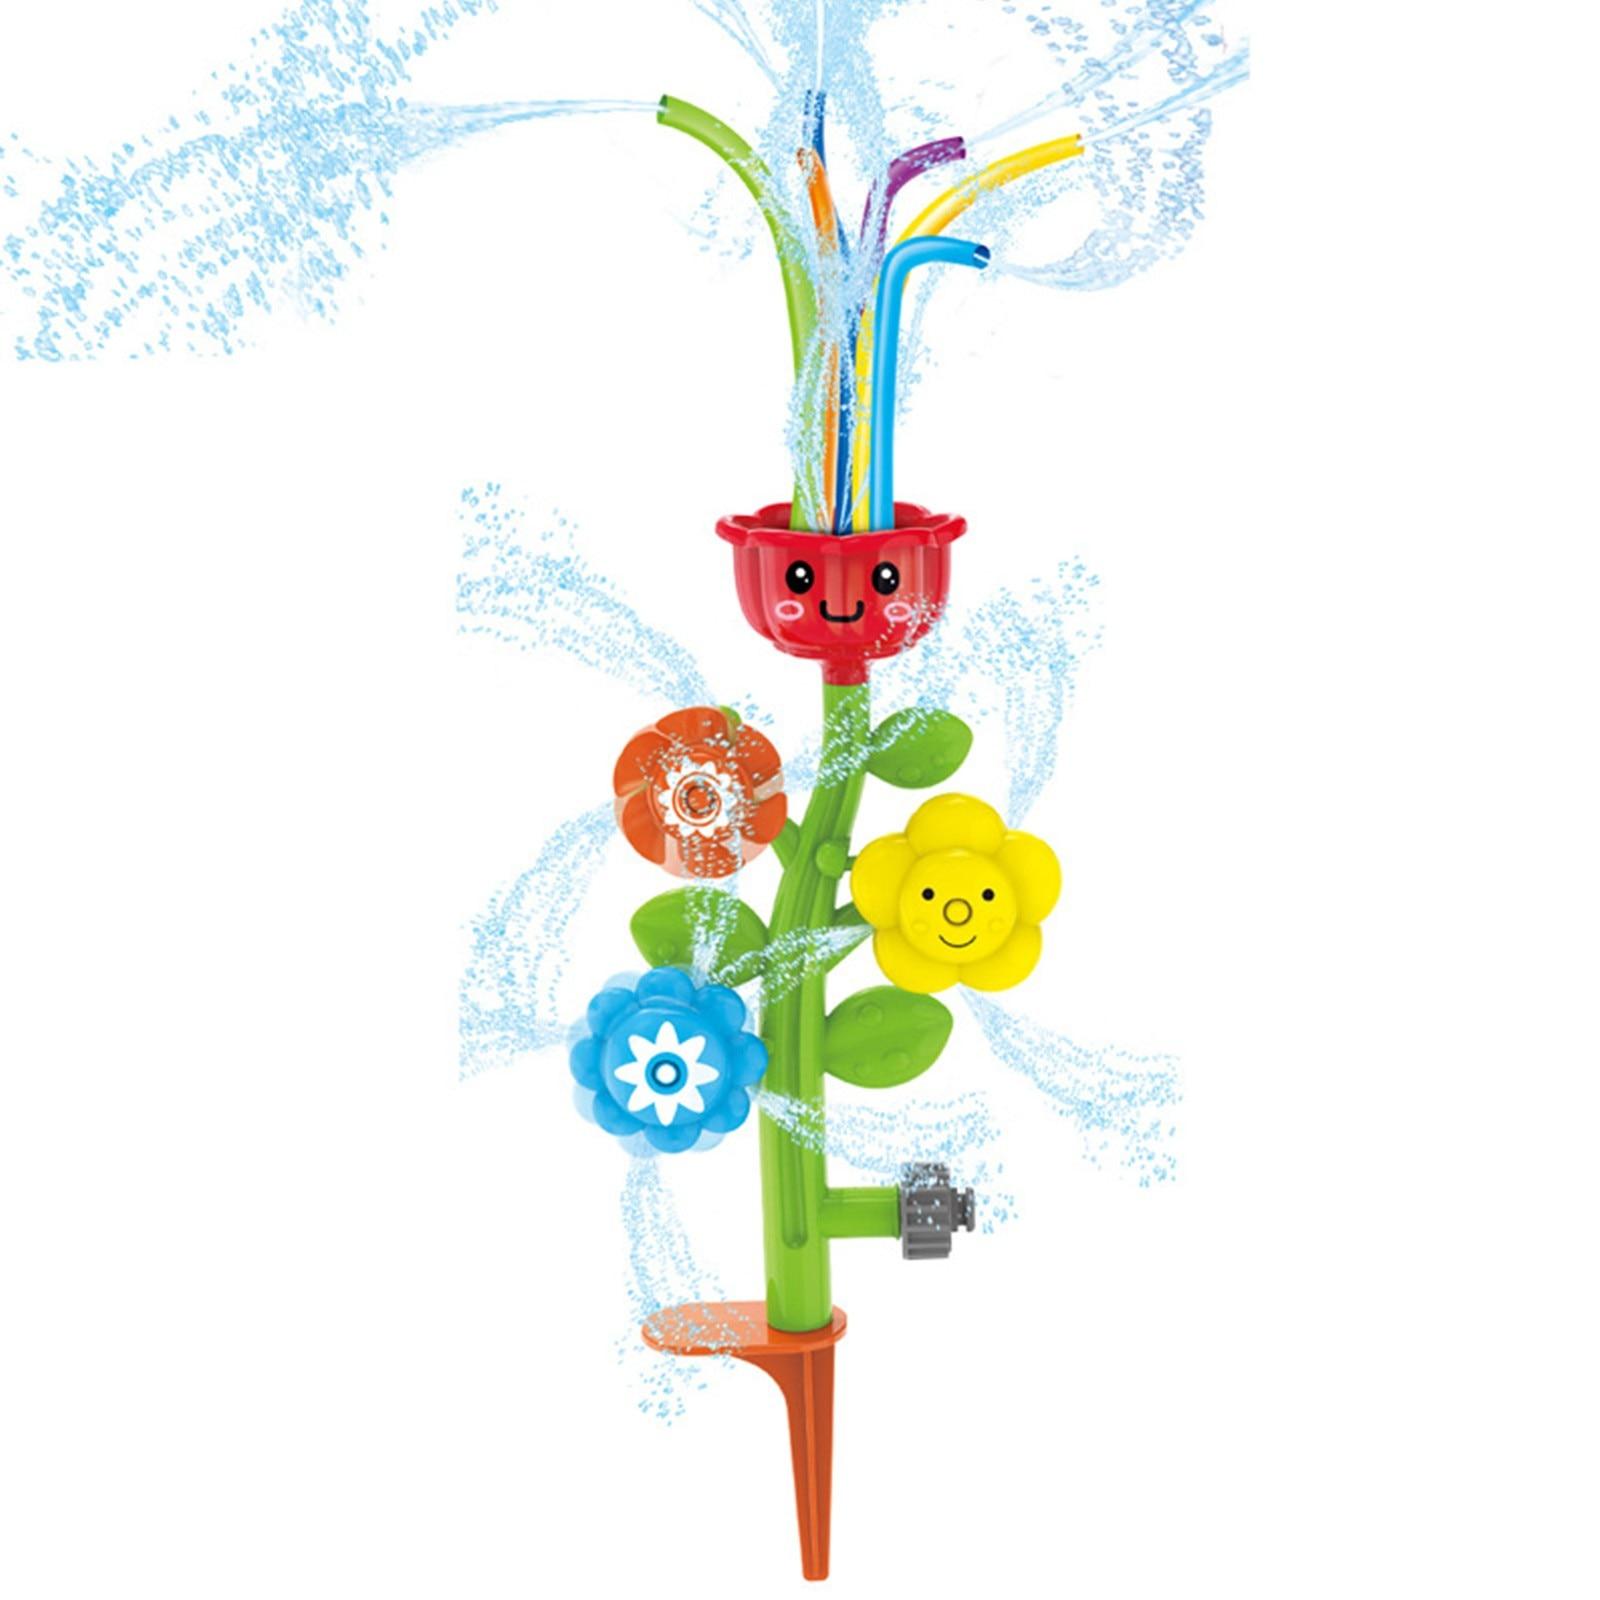 Kids Sprinkler Flower Water Spray Toy Lawn Sprinkler Splash for Yard Children Outdoor Novel Funny Summer Outdoor Water Toys FE